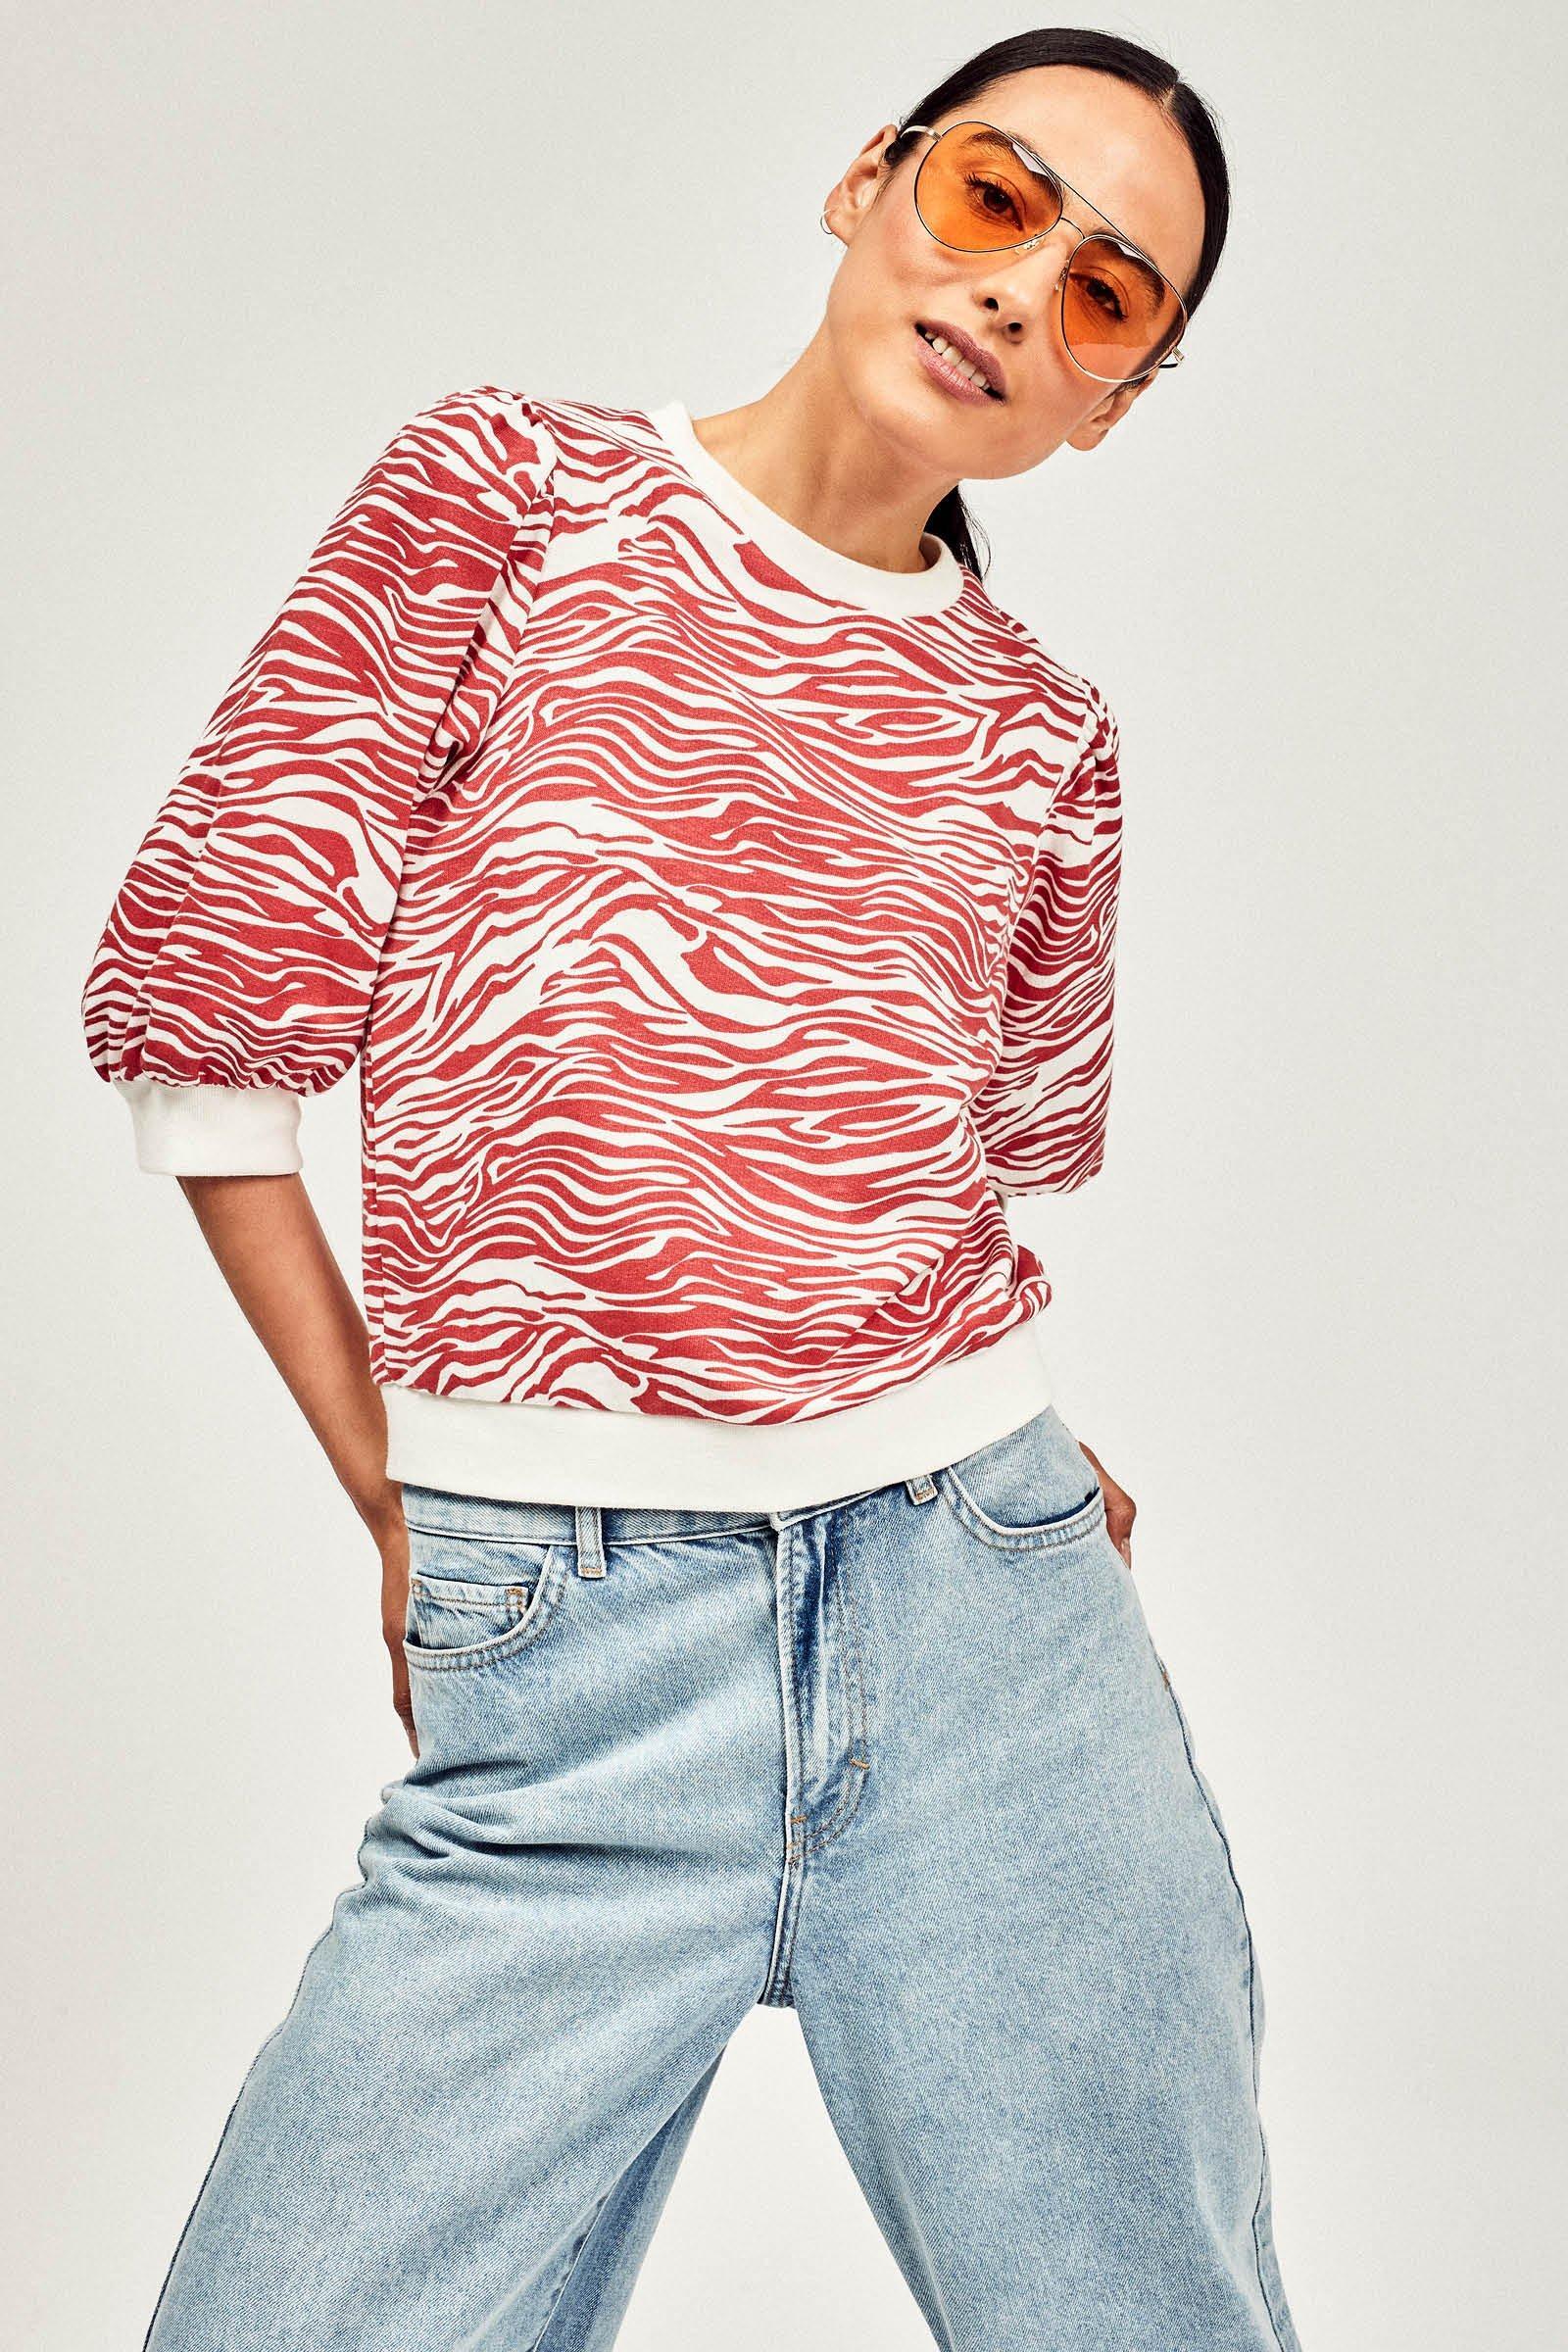 CKS Dames - NAMIBIE - sweater - donkerrood